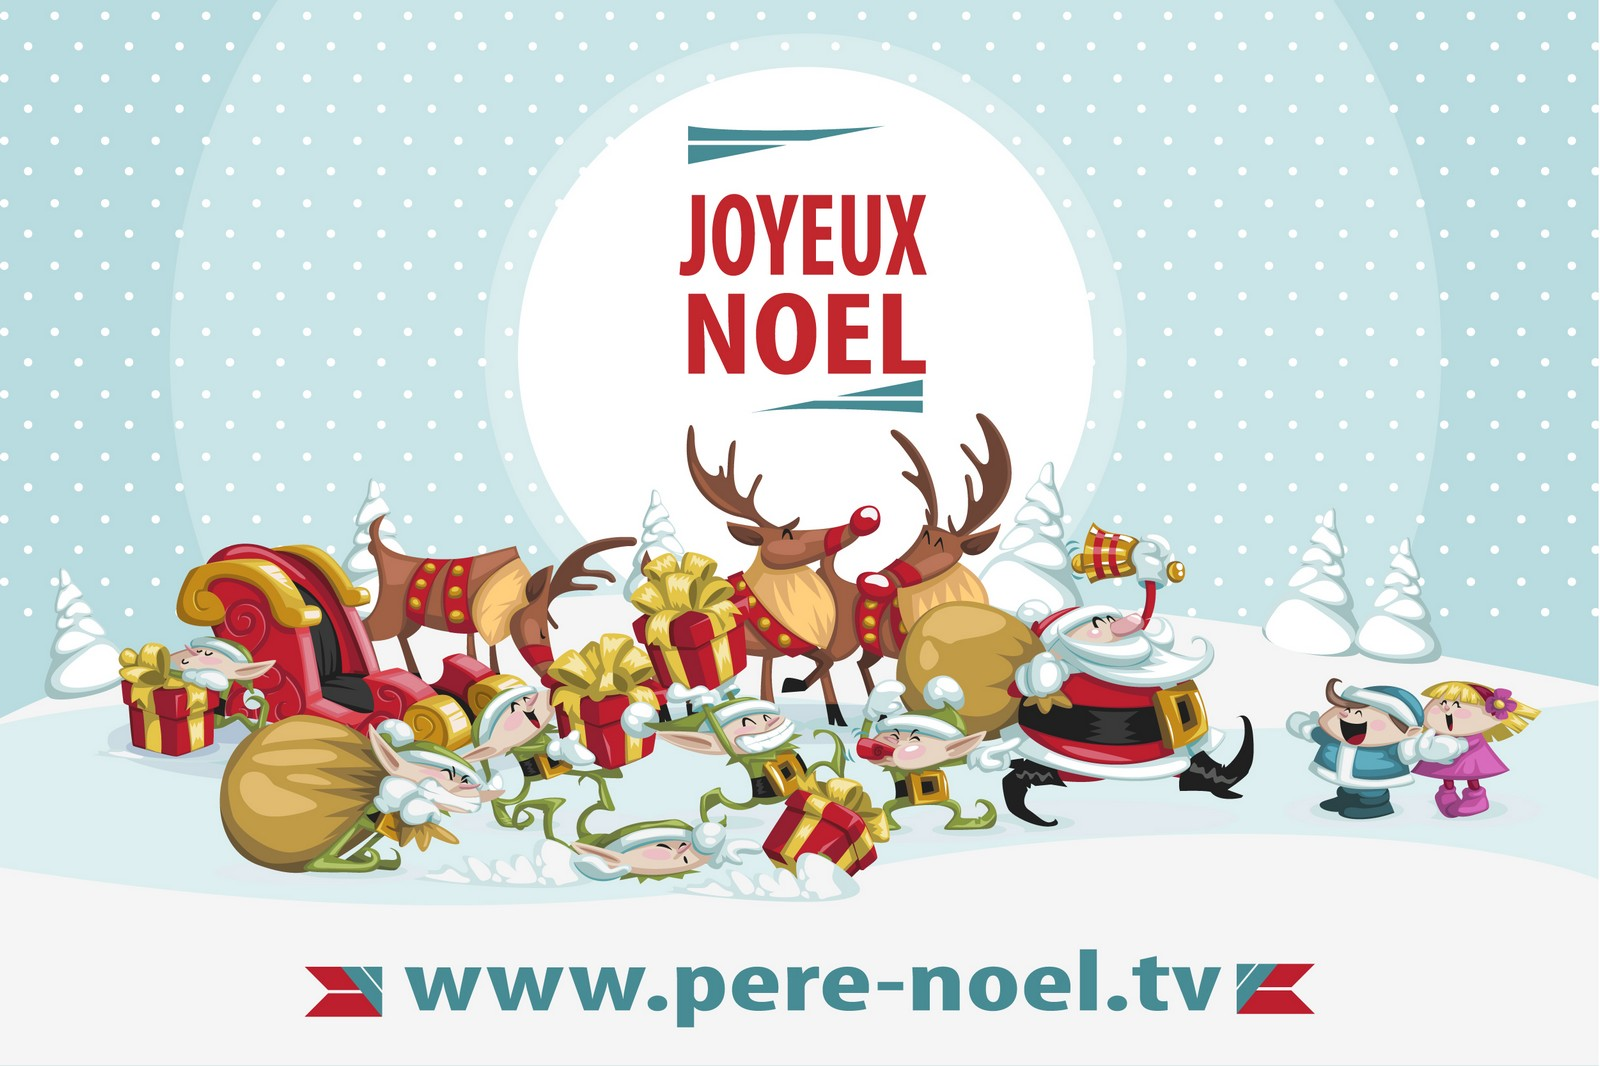 Fond ecran noel gratuit fond ecran pere noel pere - Image de noel gratuite ...